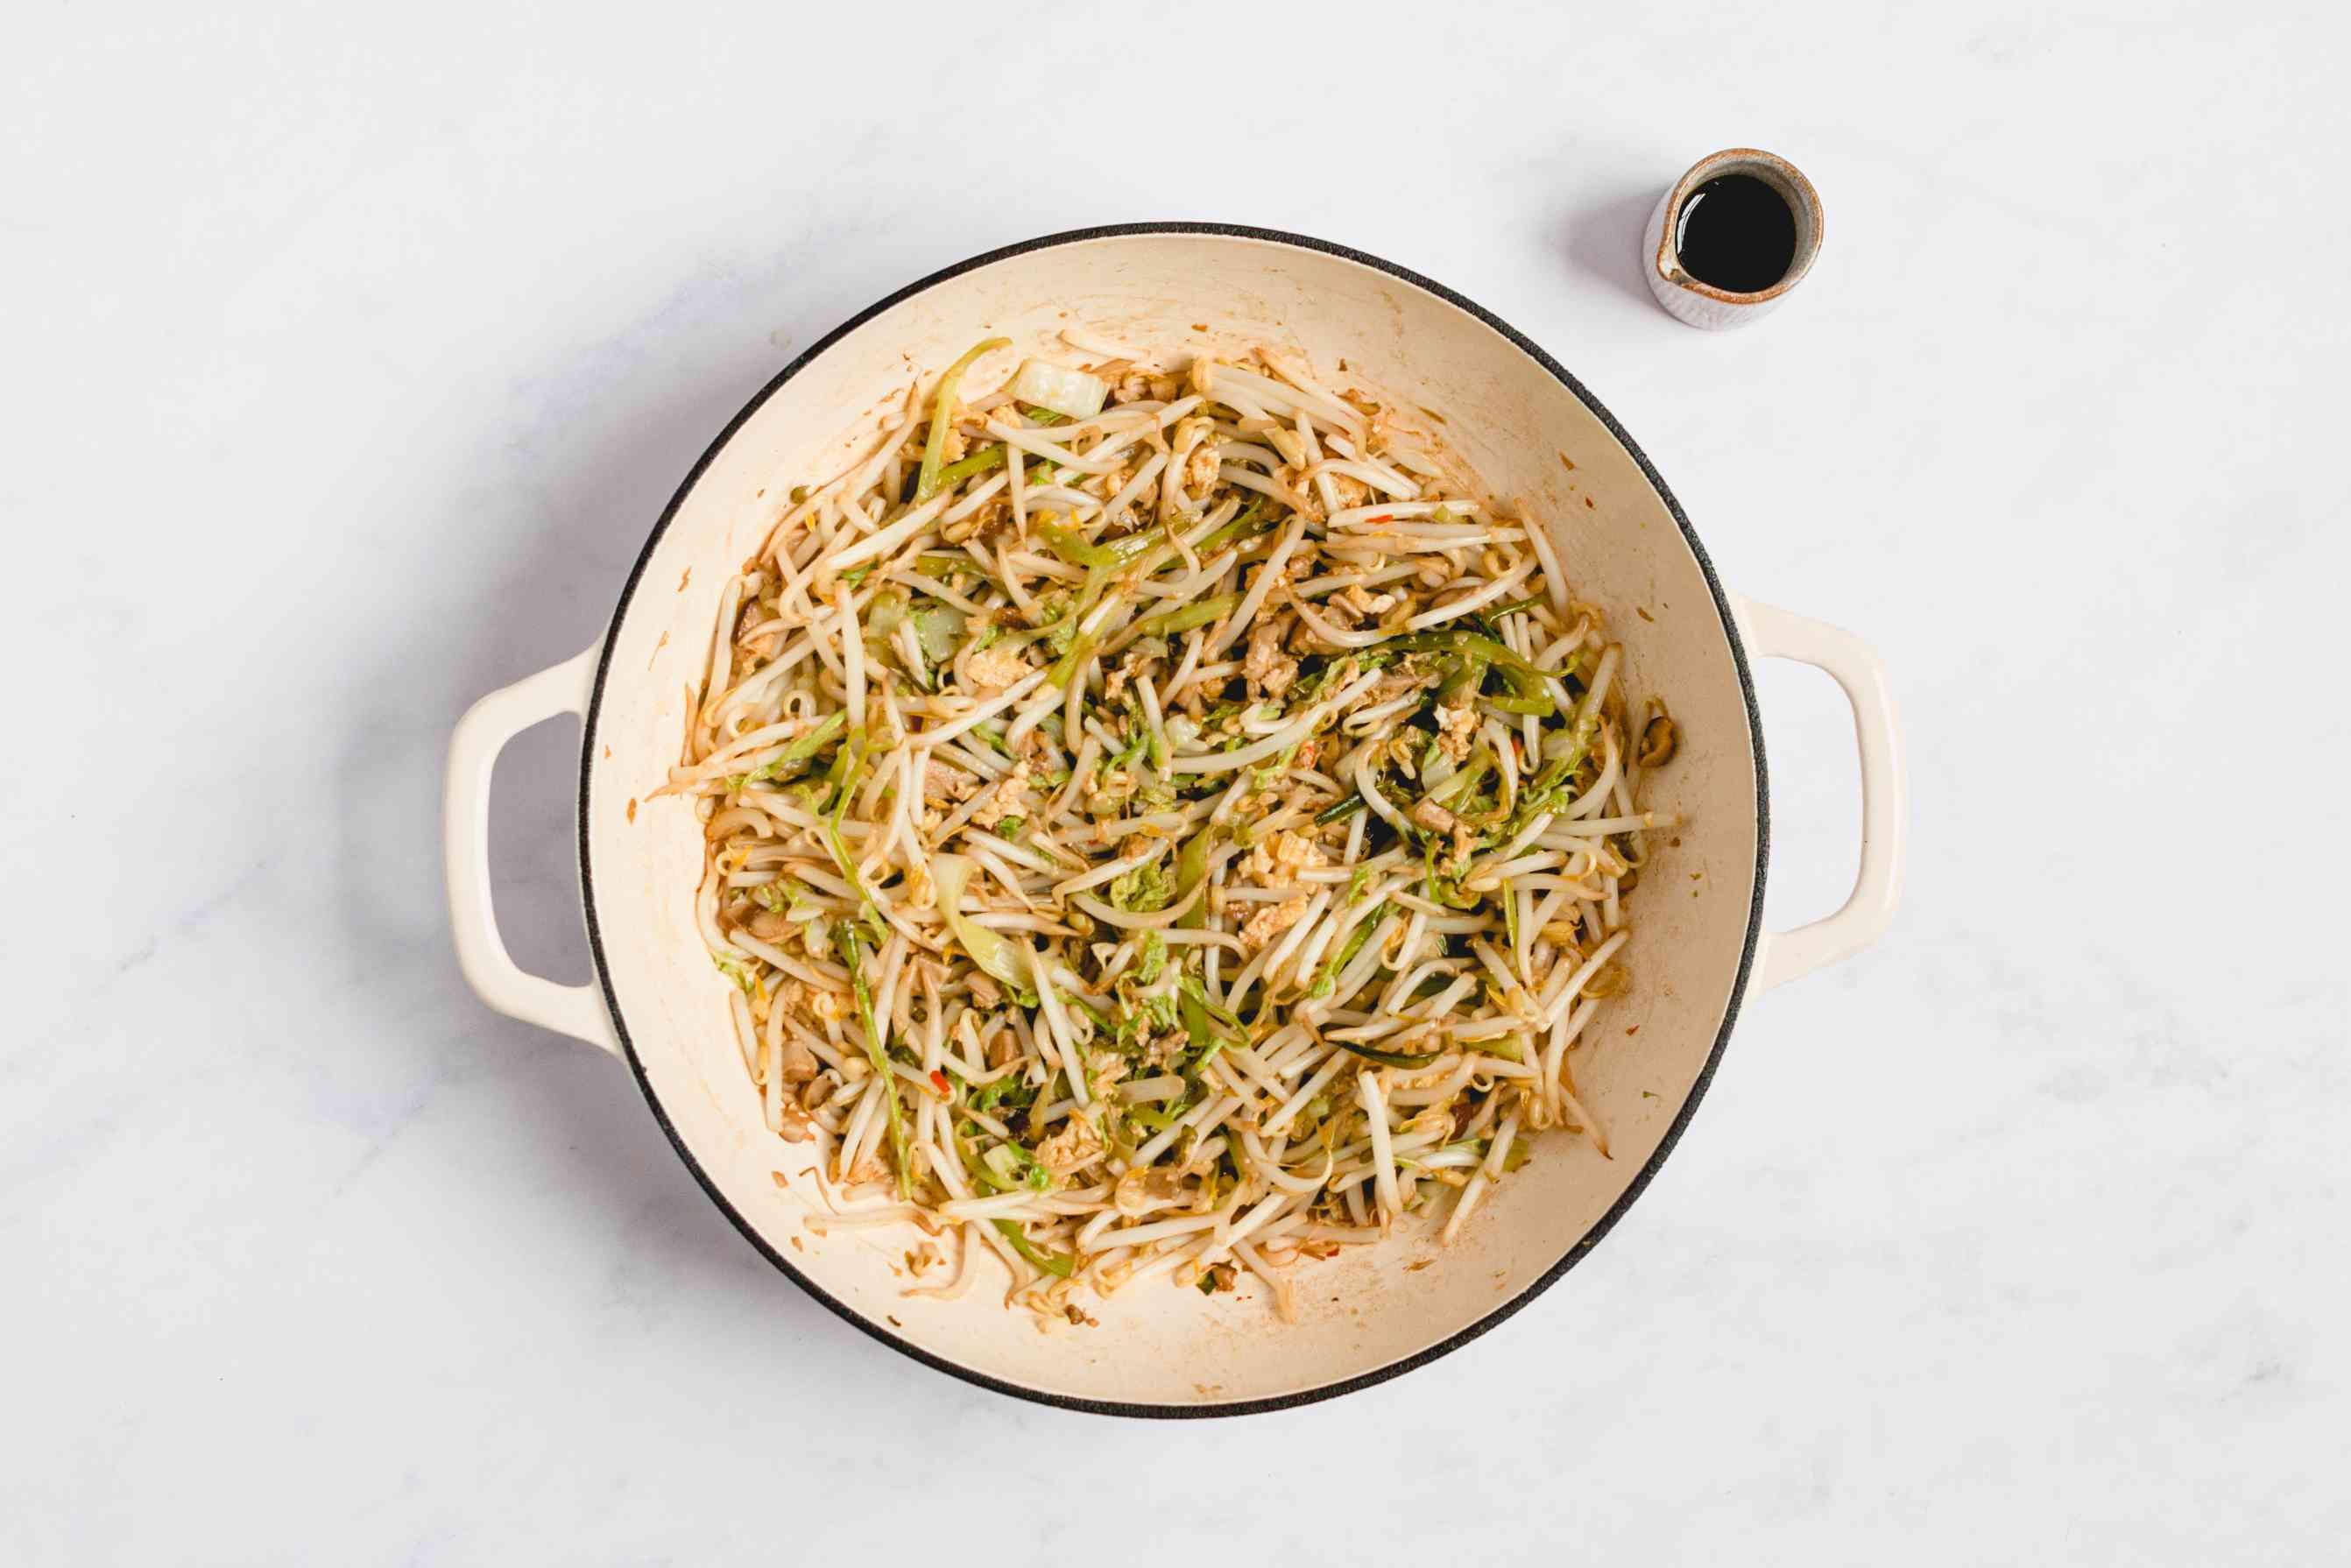 season vegetable mixture with fish sauce